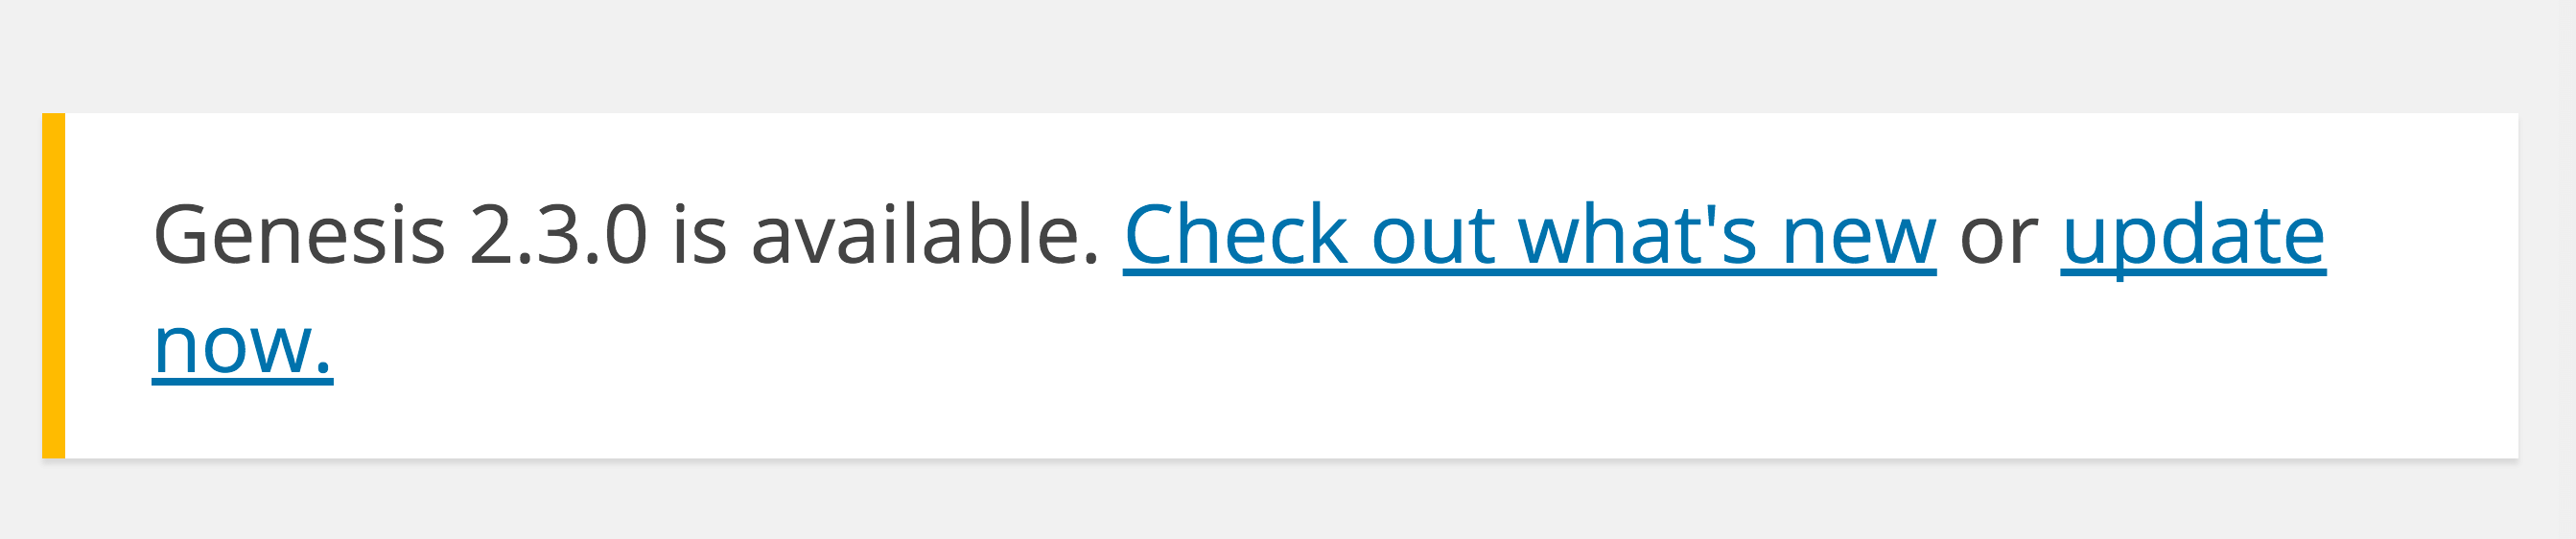 Genesis 2.3 Update Notification WordPress